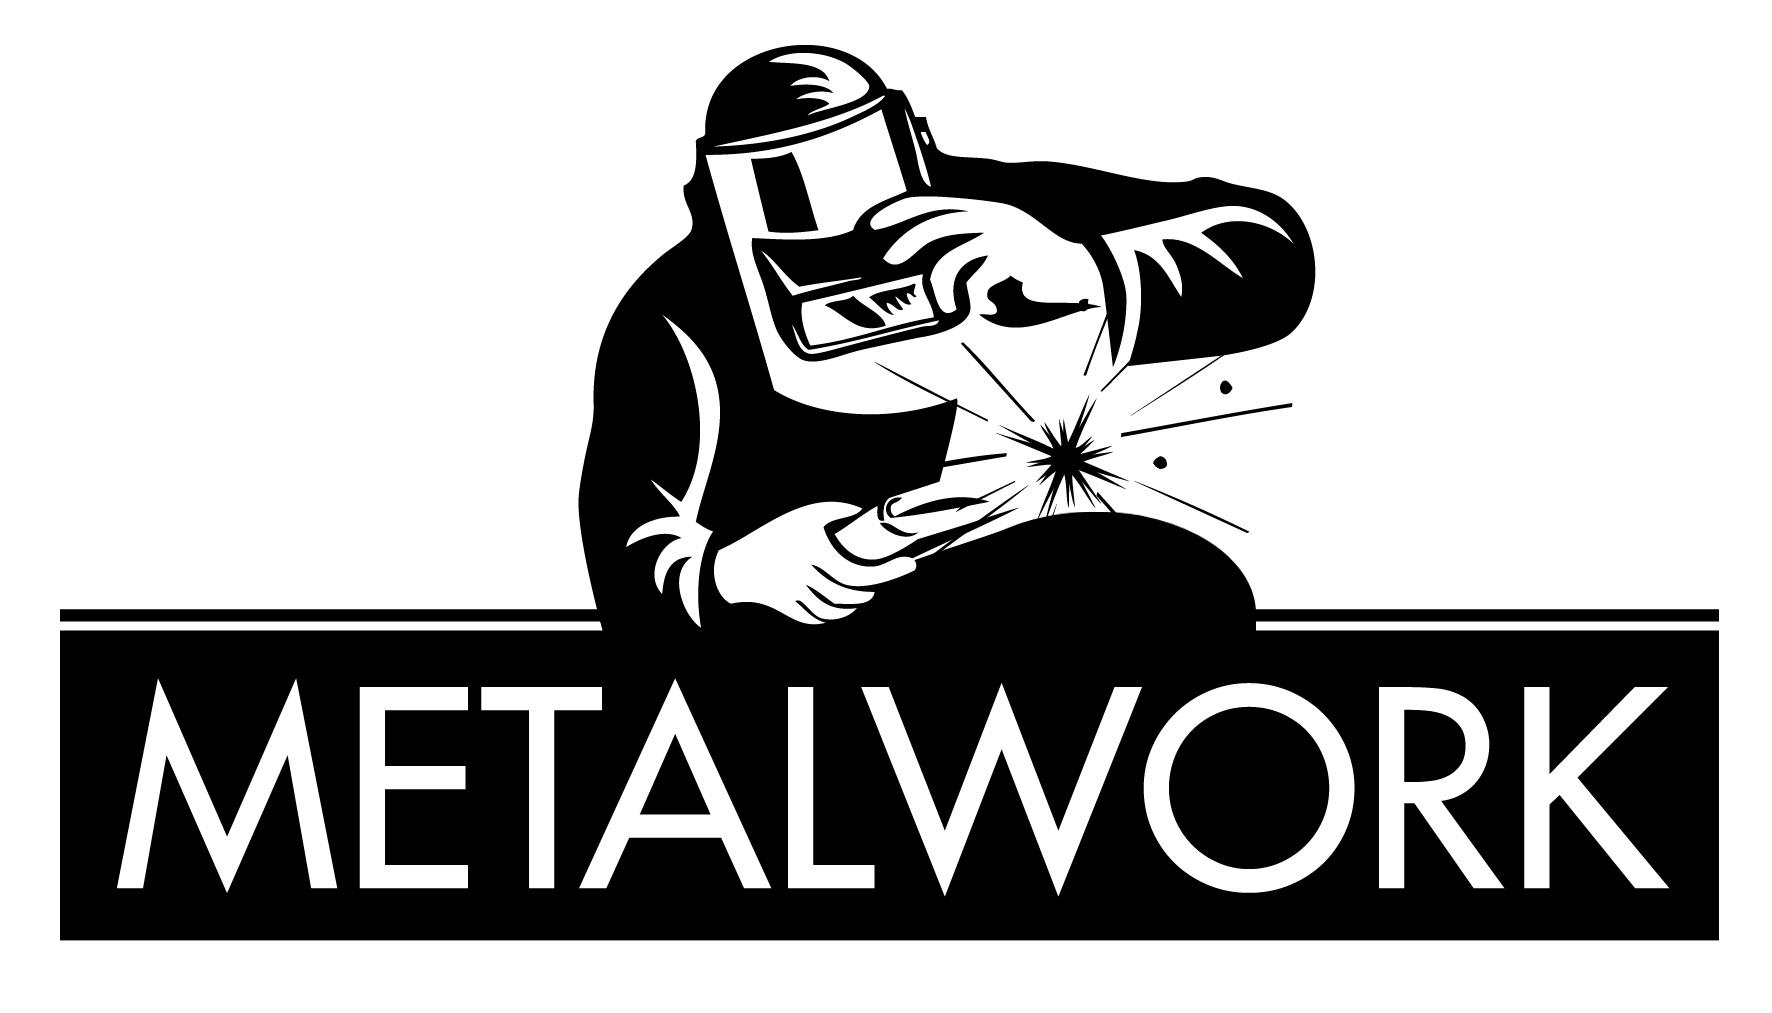 Metalwork